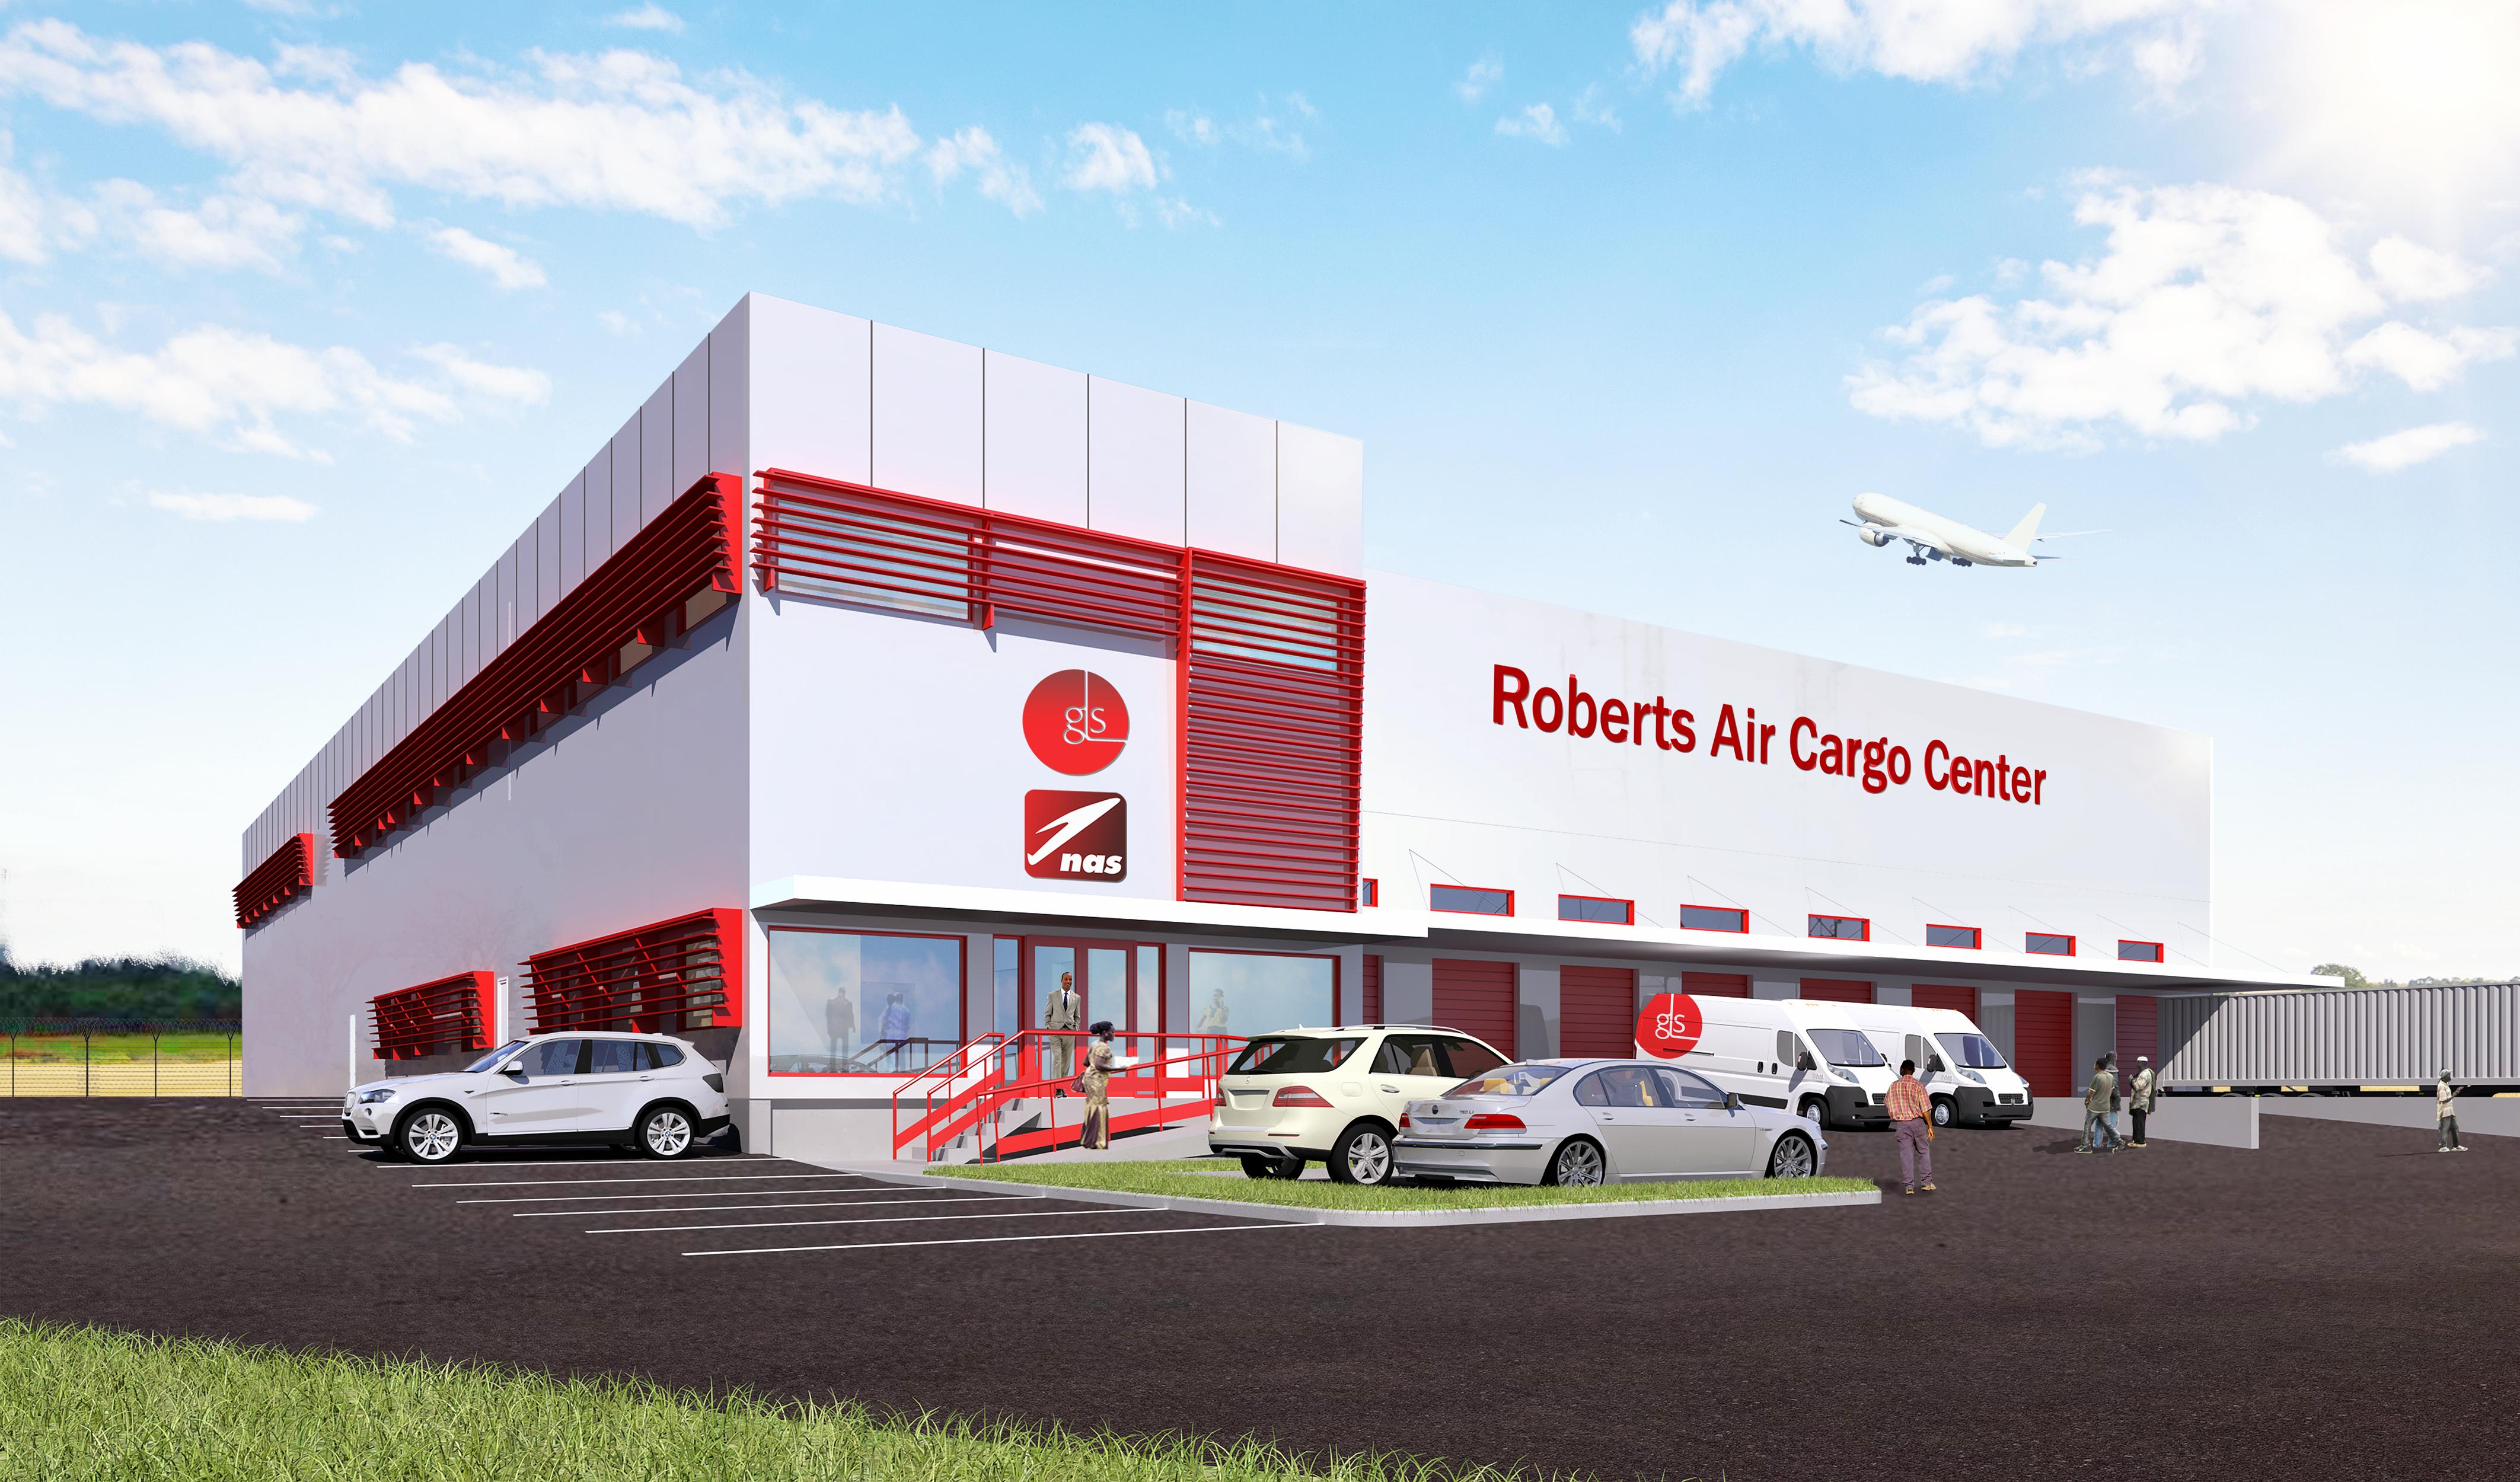 20190203_Roberts Air Cargo Center-Red